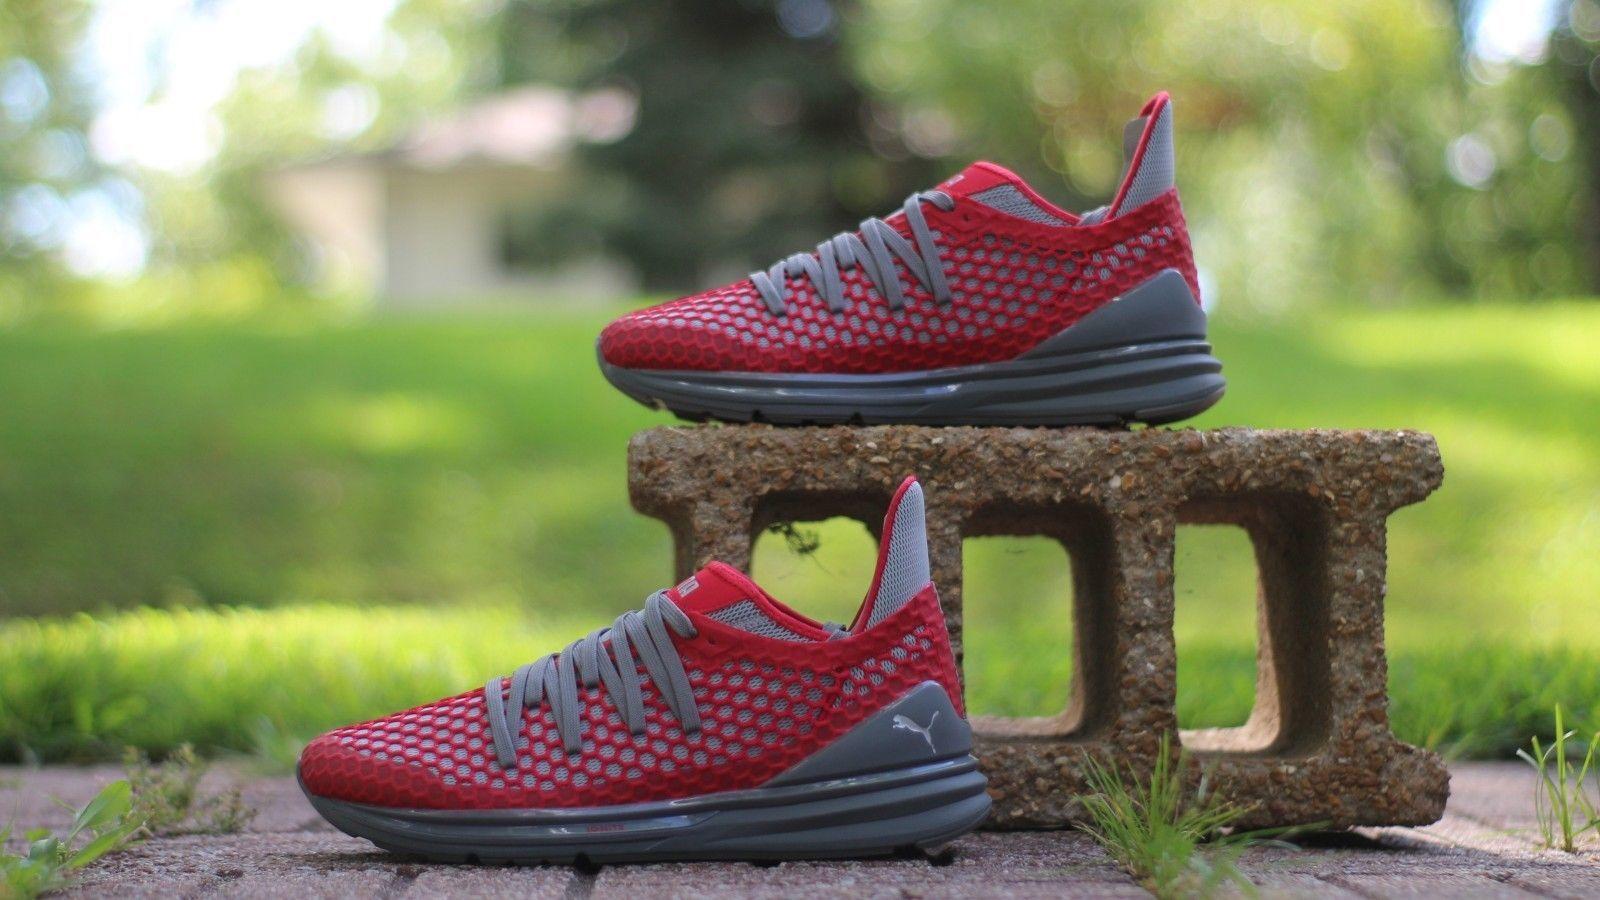 cf5463129f5f PUMA Men's Size 10 Ignite Limitless Netfit Sneaker 189983 02 Red